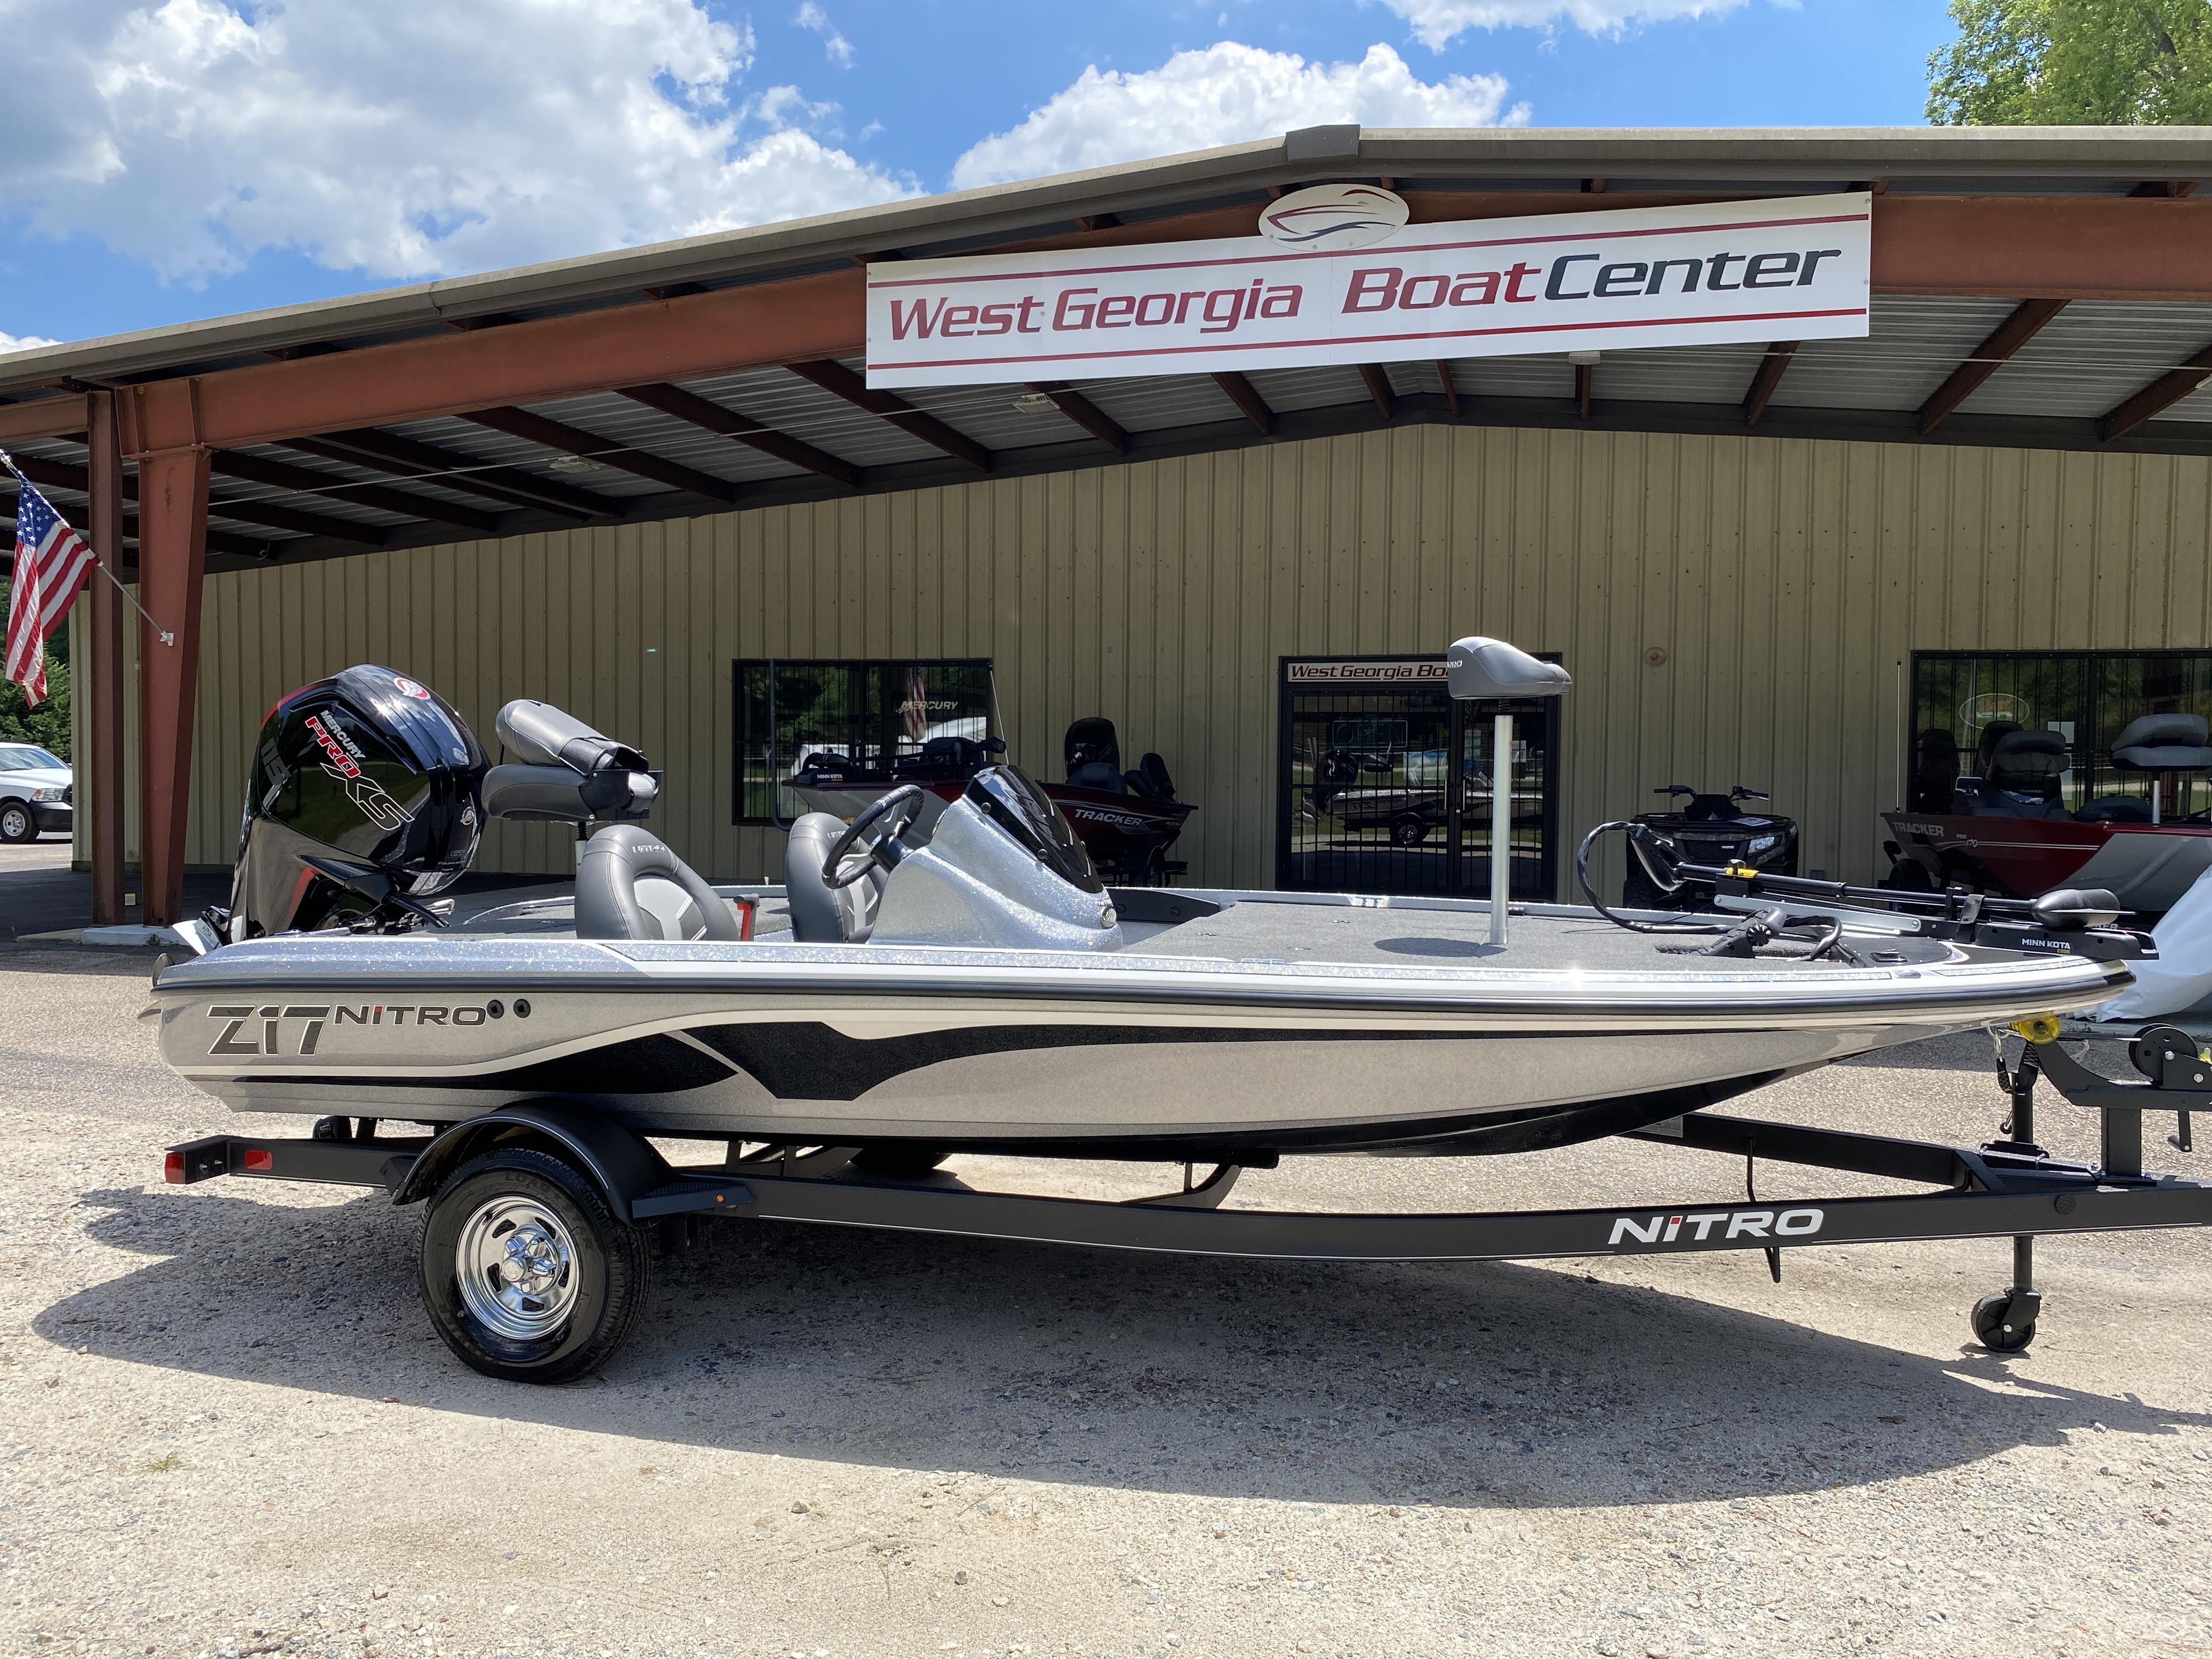 2022 Nitro boat for sale, model of the boat is Z17 & Image # 10 of 20